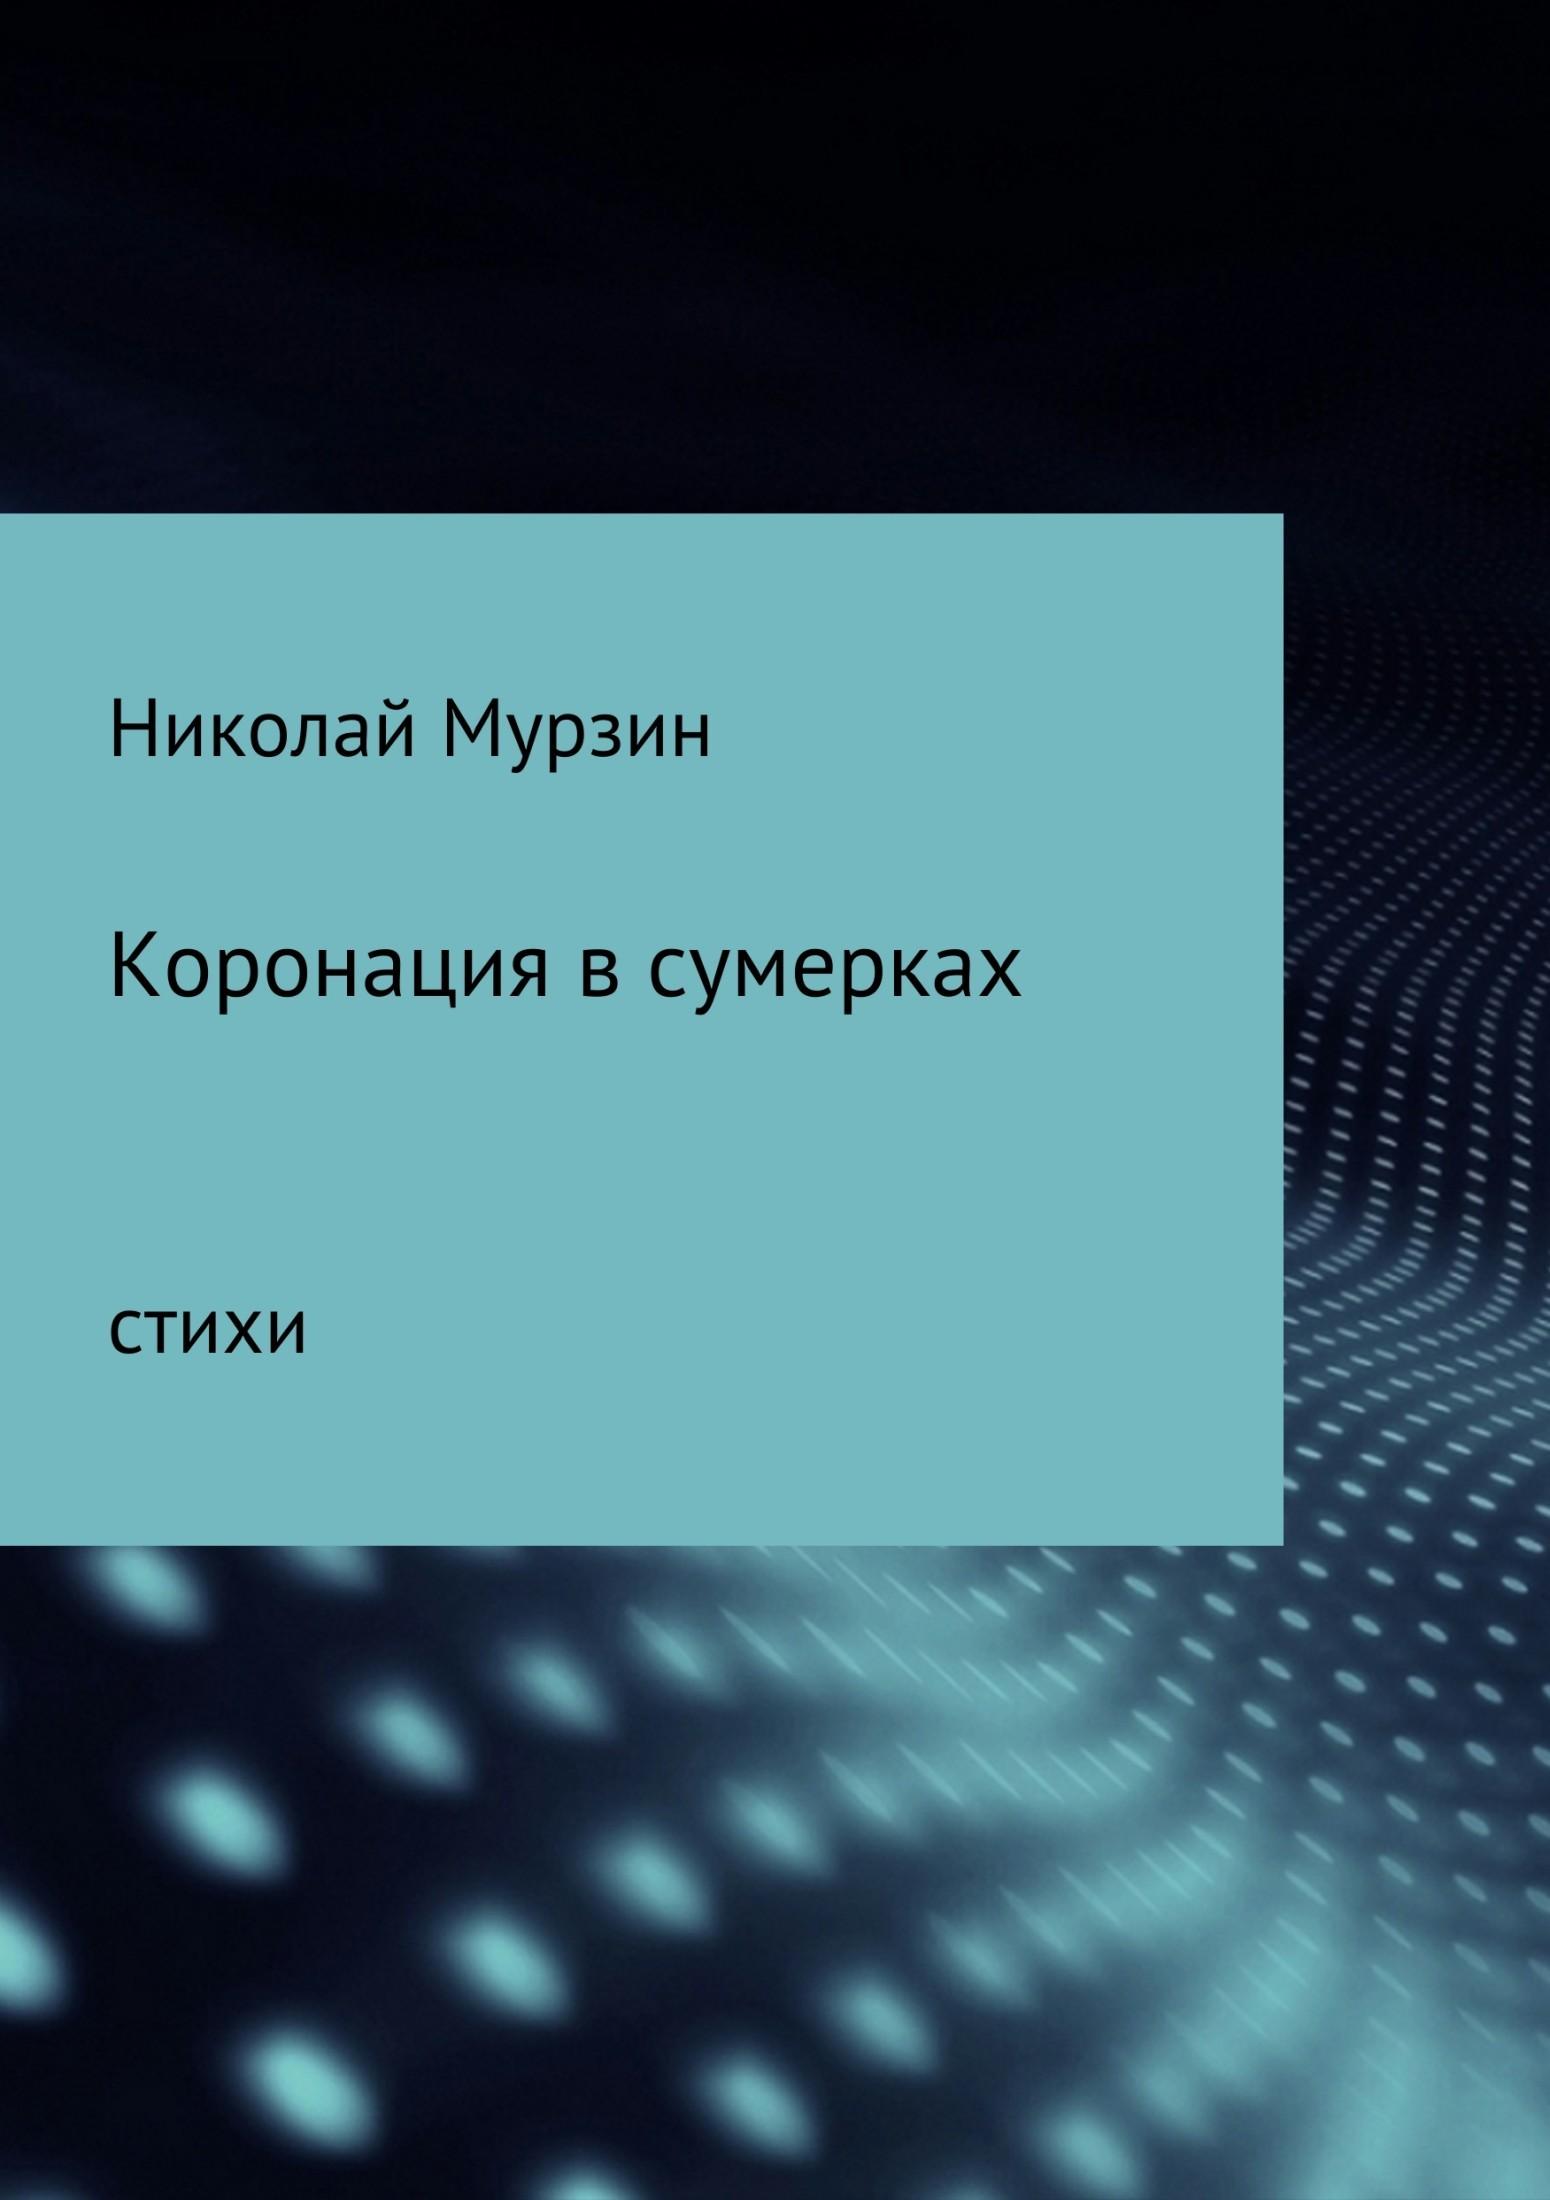 Николай Николаевич Мурзин Коронация в сумерках николай николаевич мурзин коронация в сумерках